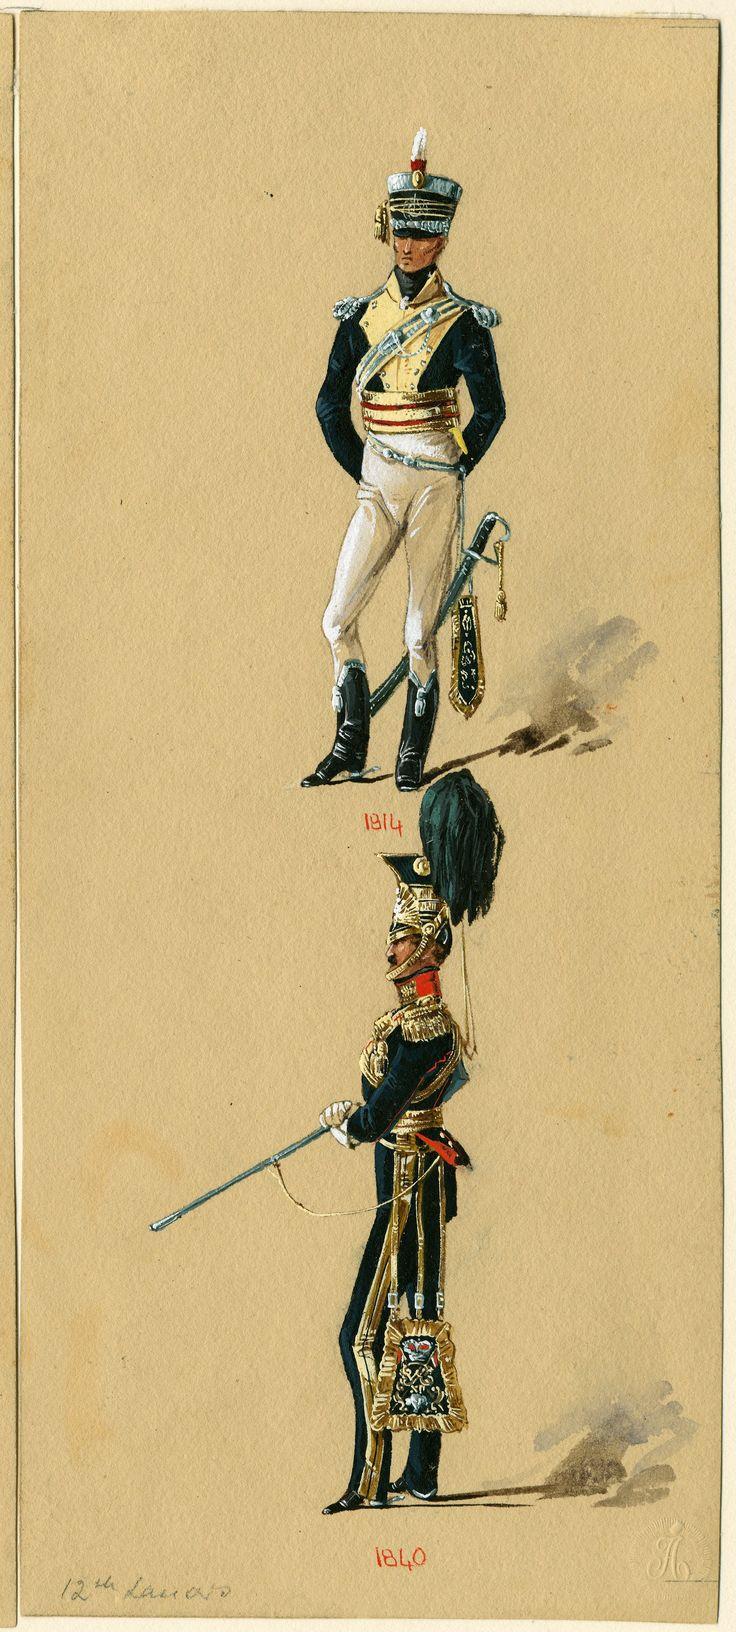 British; 12th Light Dragoons, Officer 1814 & 12th Lancers, Officer 1840 by Reginald Augustus Wymer